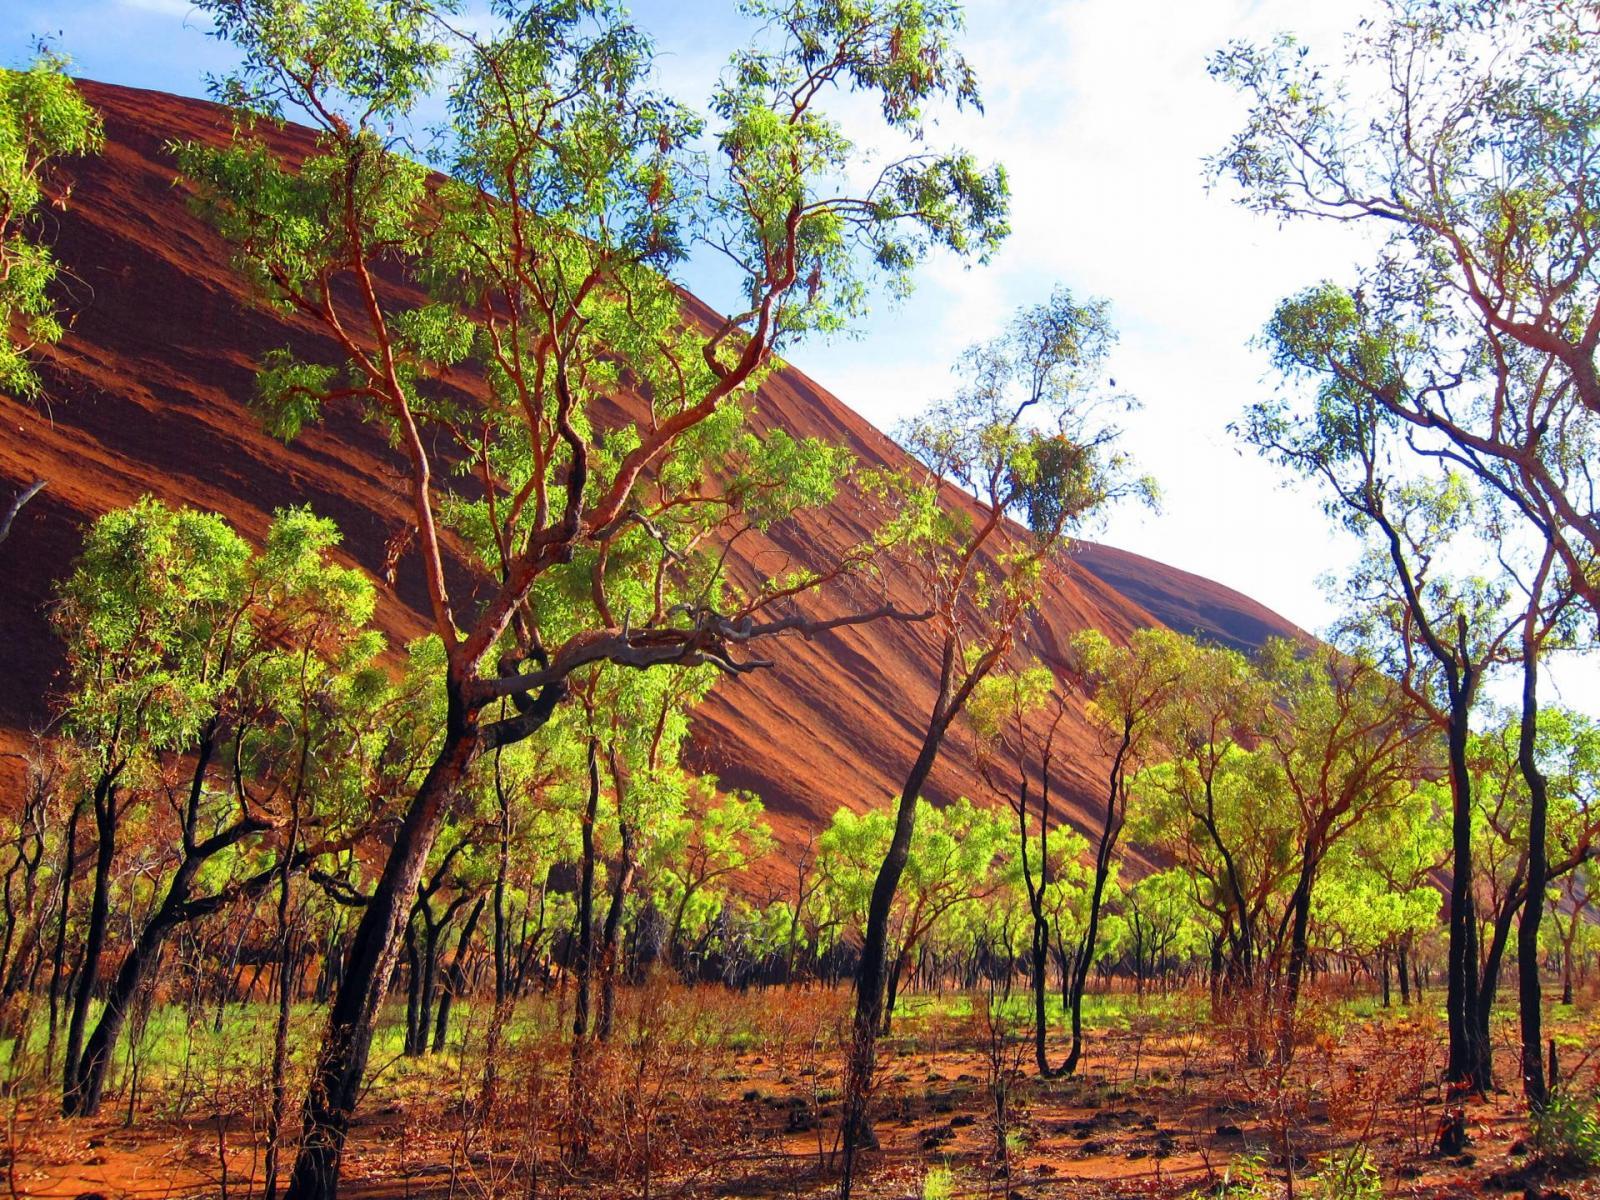 Helikopterflug Uluru Australien Ayers Rock